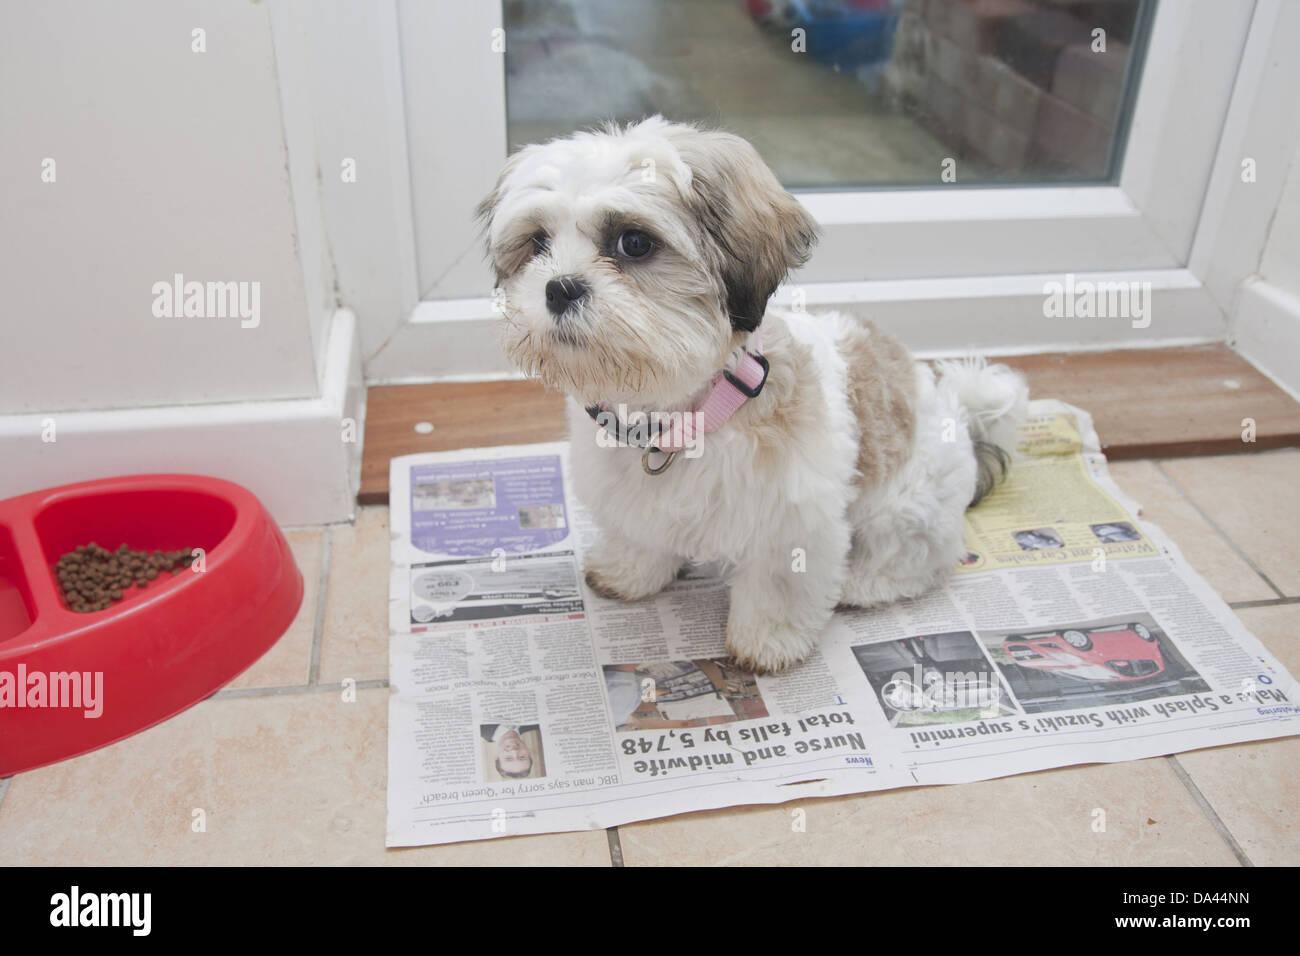 Domestic Dog Shih Tzu Puppy Toilet Training On Newspaper Beside